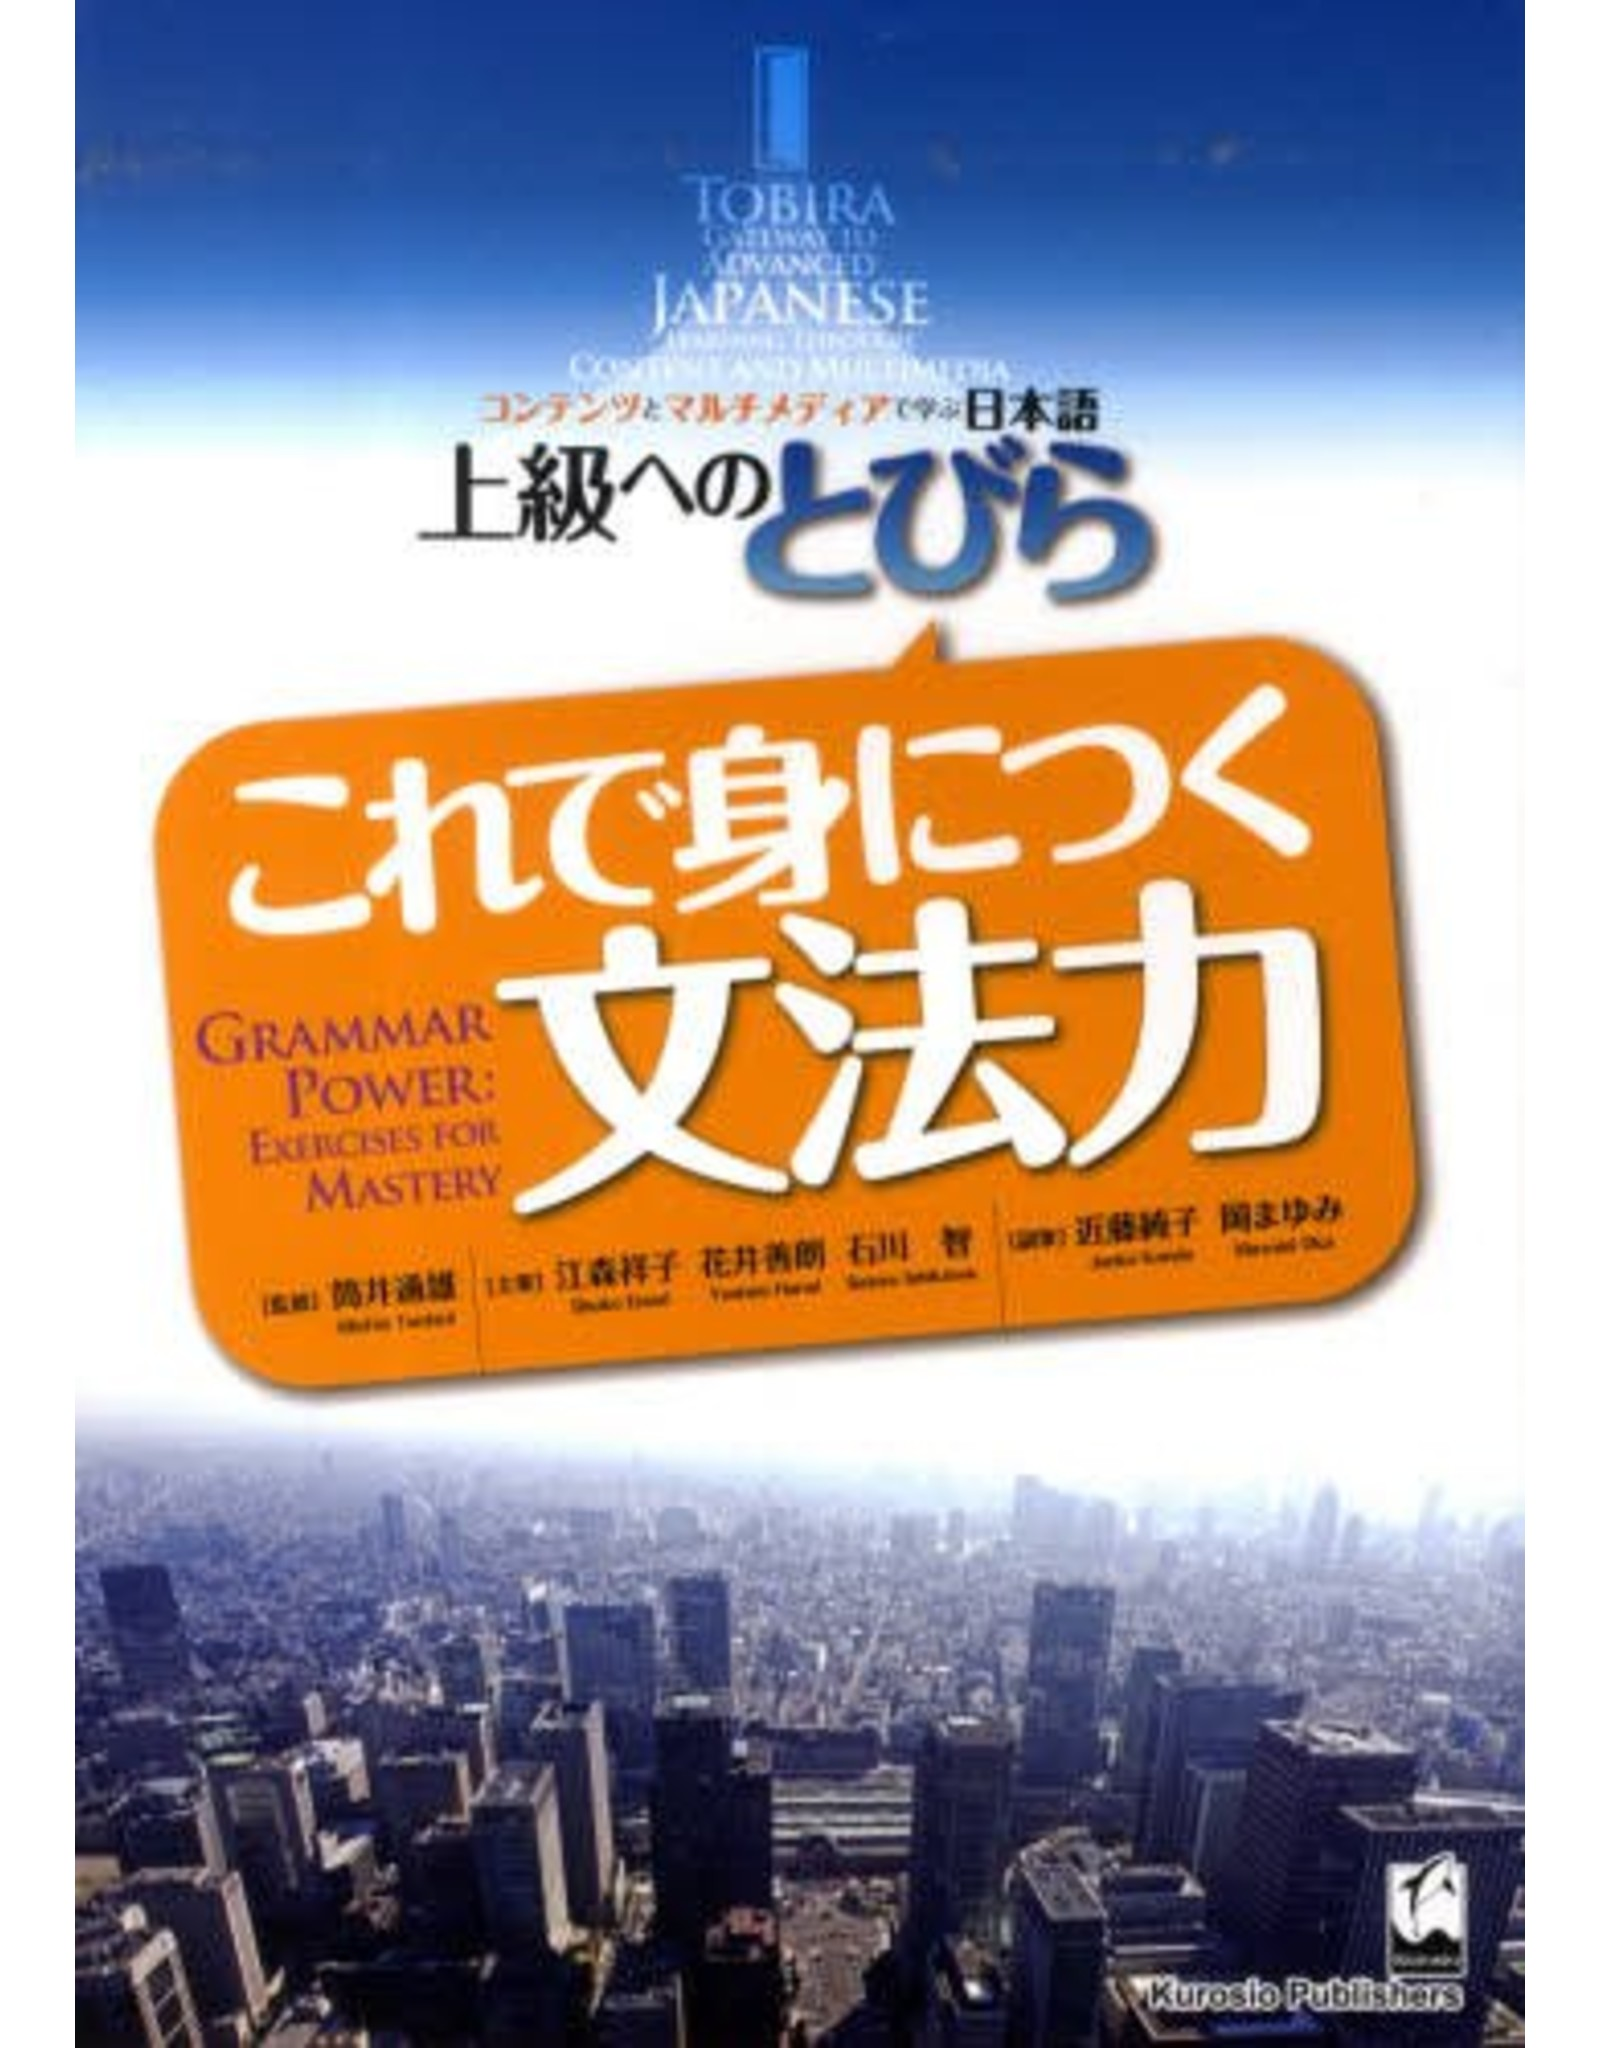 KUROSHIO TOBIRA, GATEWAY TO ADVANCED JAPANESE : GRAMMAR POWER EXERCISES FOR MASTERY